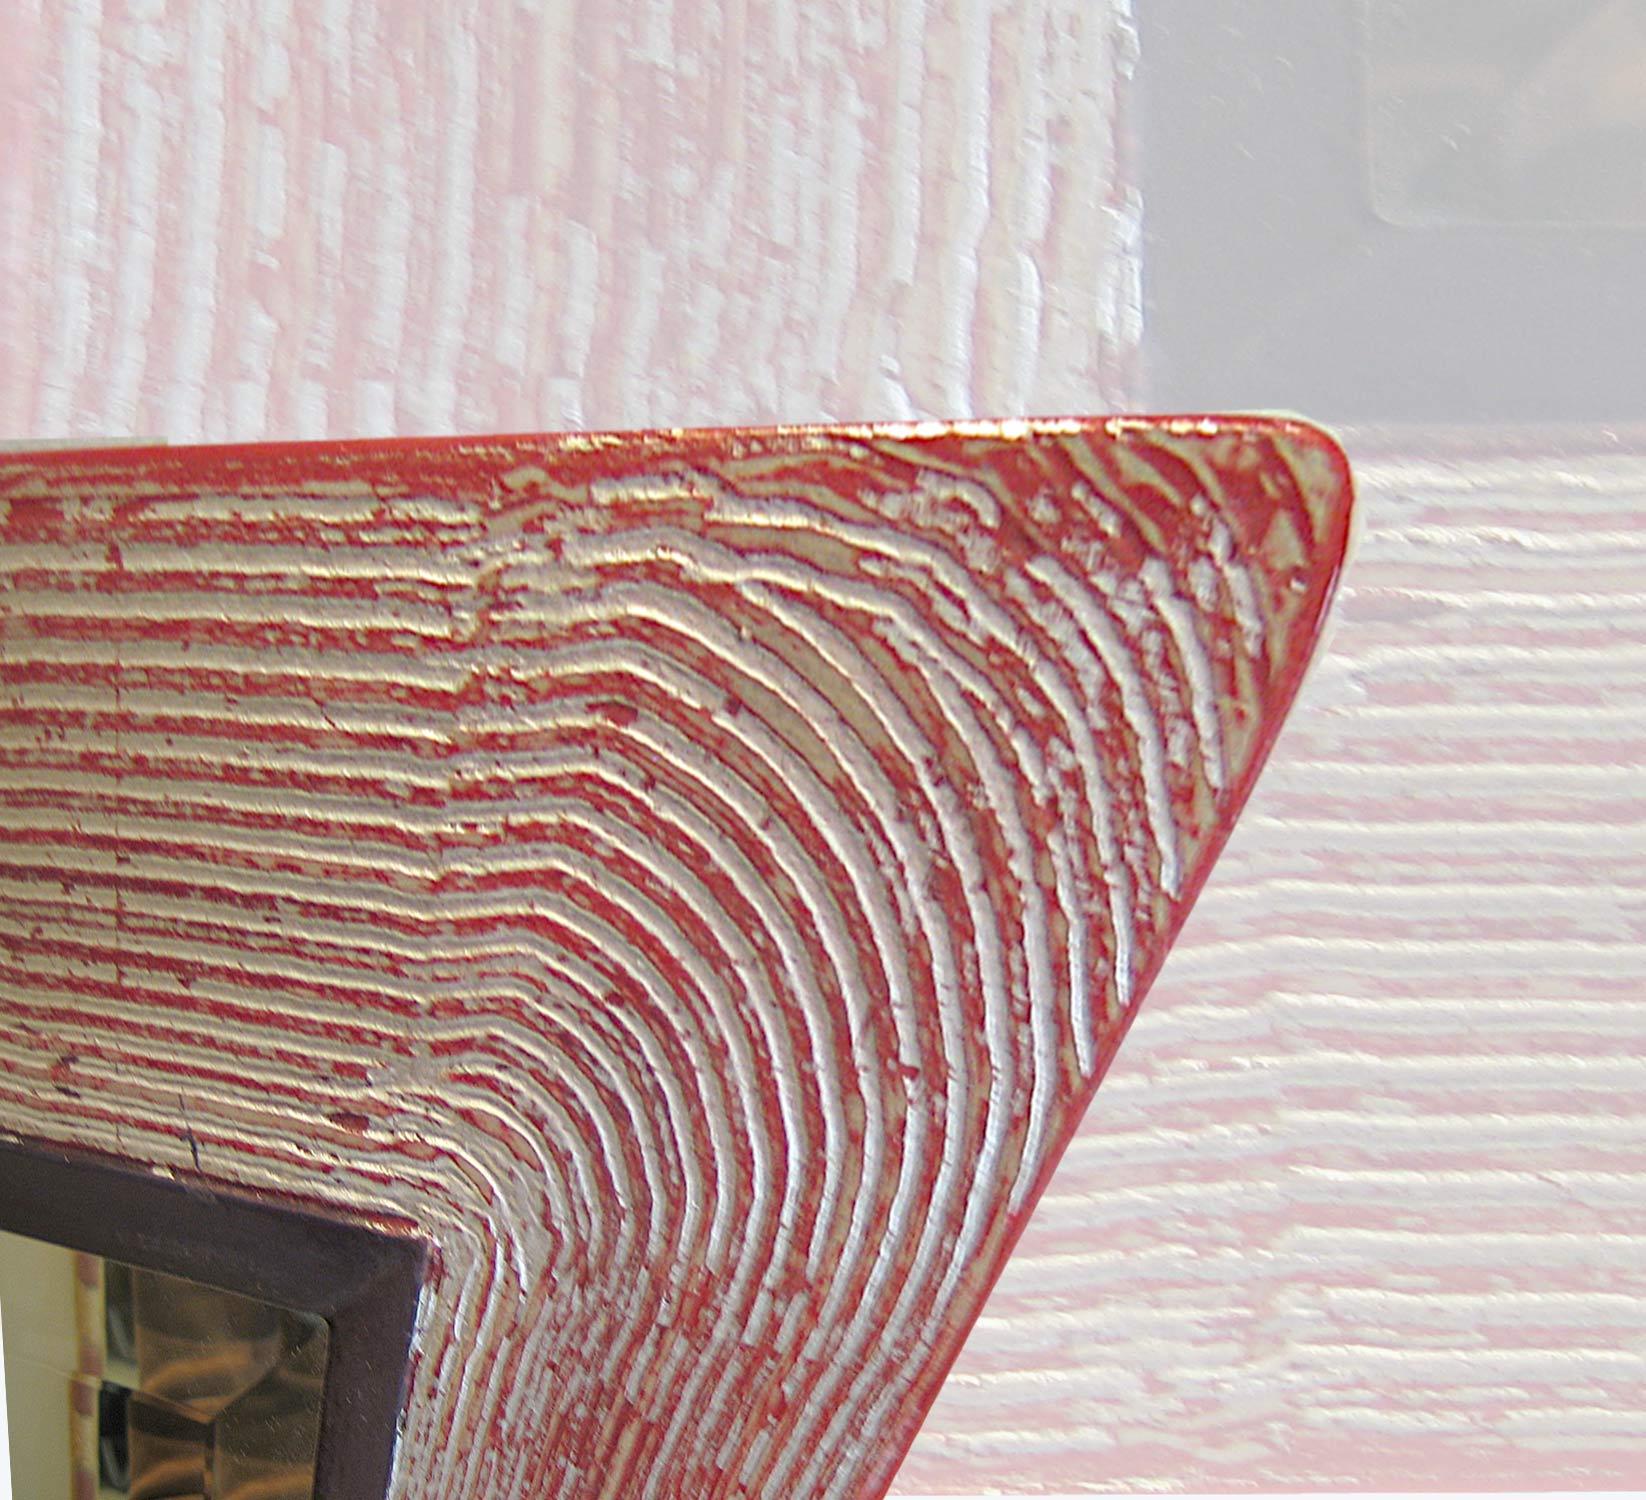 Ausschnitt - Spiegelrahmen ` wave ´ rot